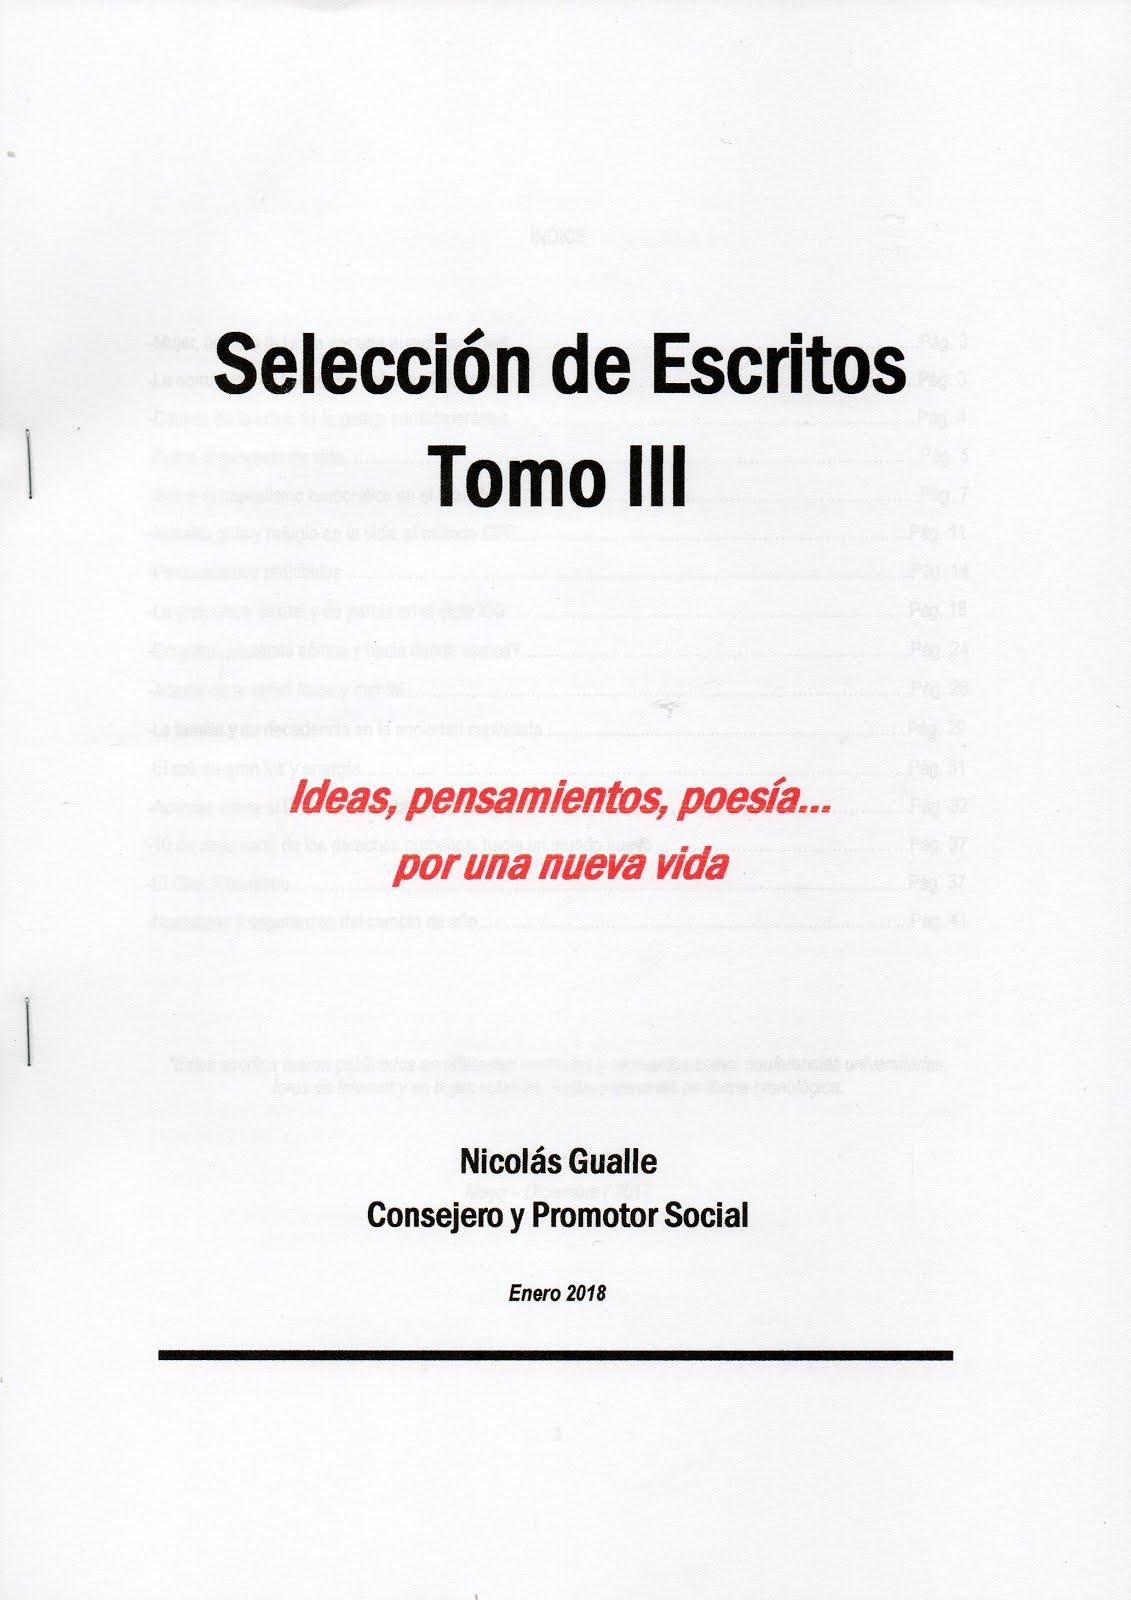 SELECCIÓN DE ESCRITOS TOMO III - NICOLÁS GUALLE